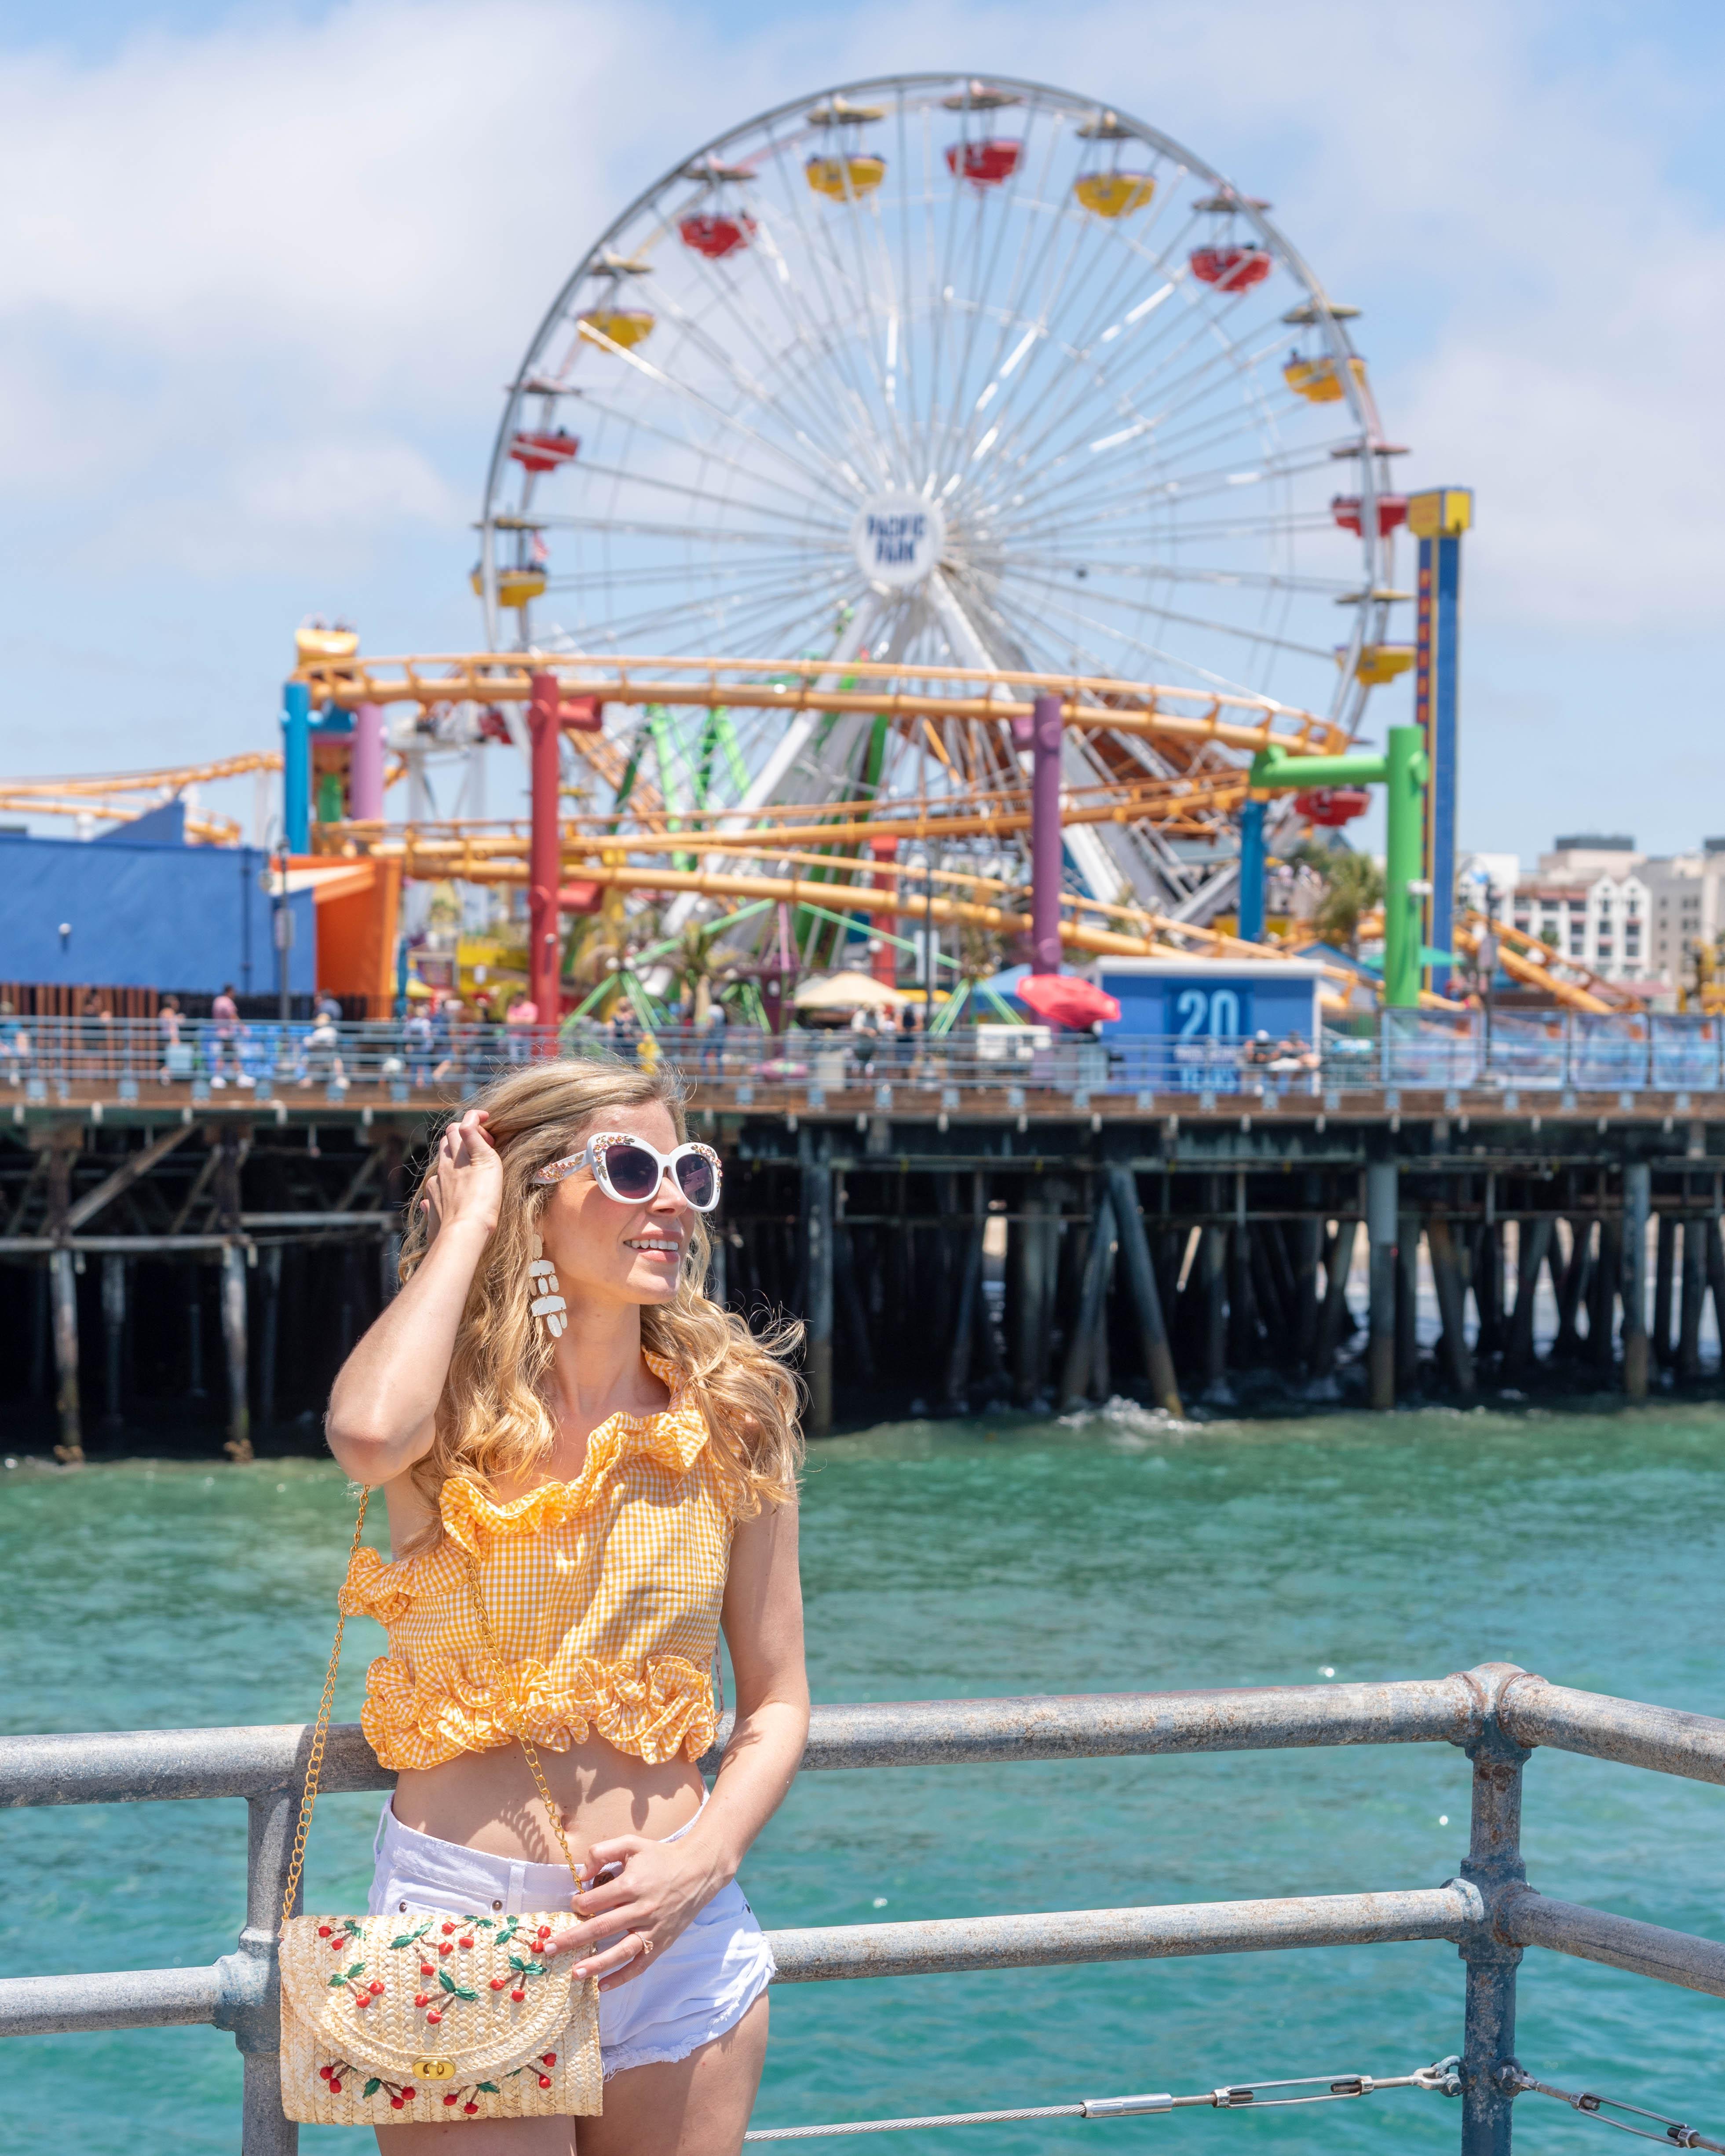 Santa Monica Pier Ferris wheel Pacific Park California Travel Guide to Los Angeles